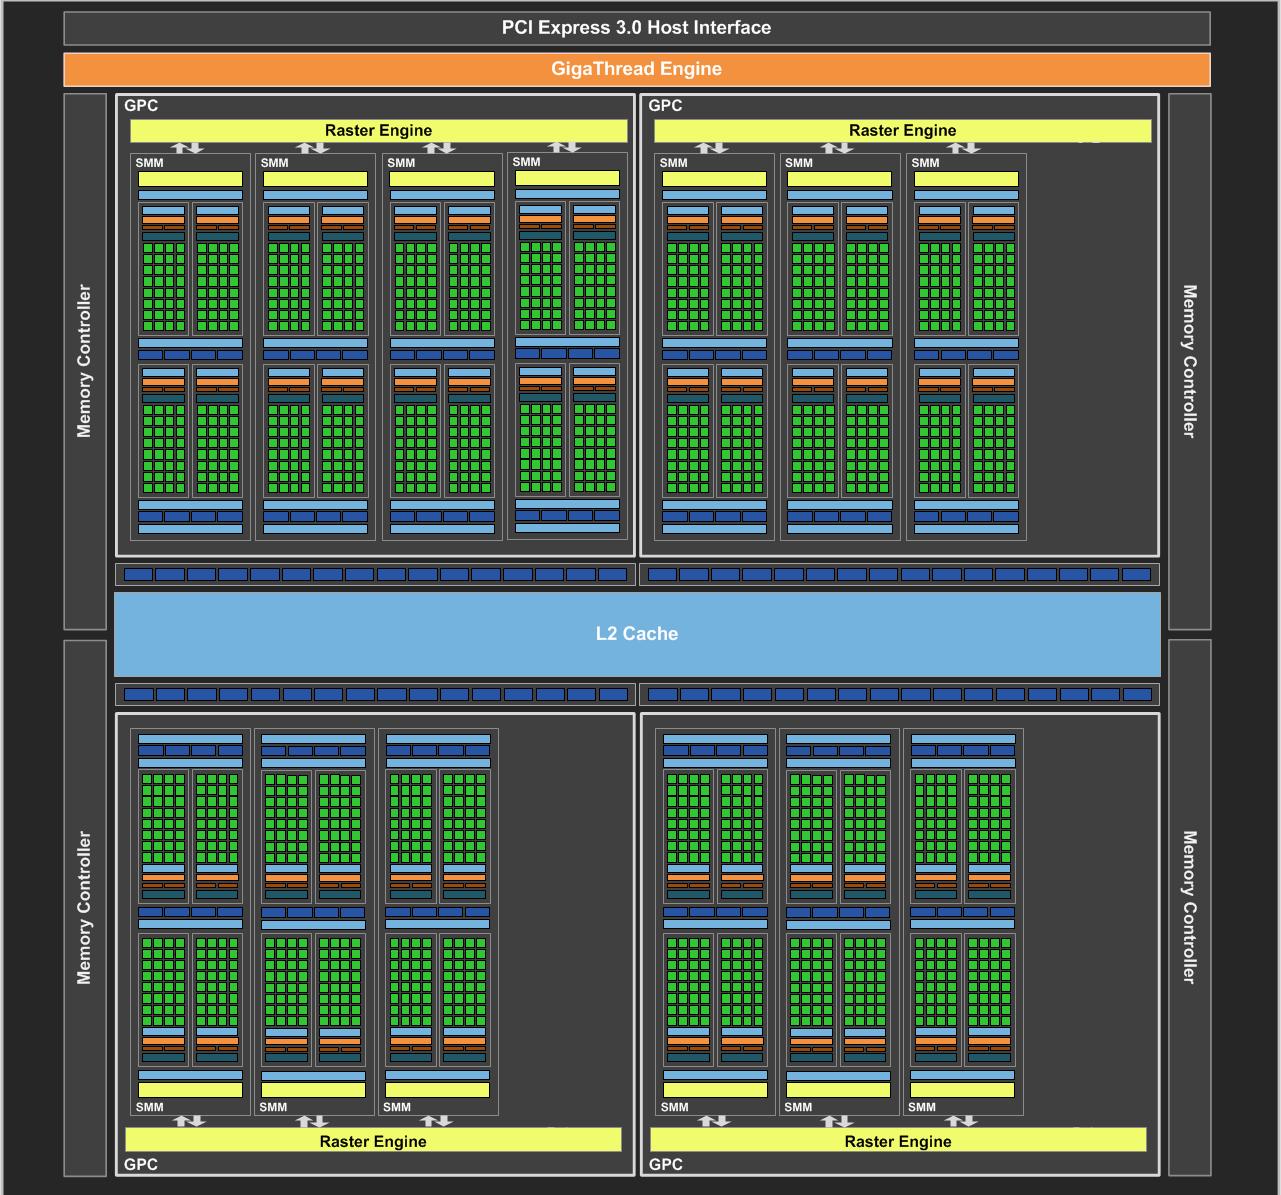 Nvidia Publishes Statement On Geforce Gtx 970 Memory